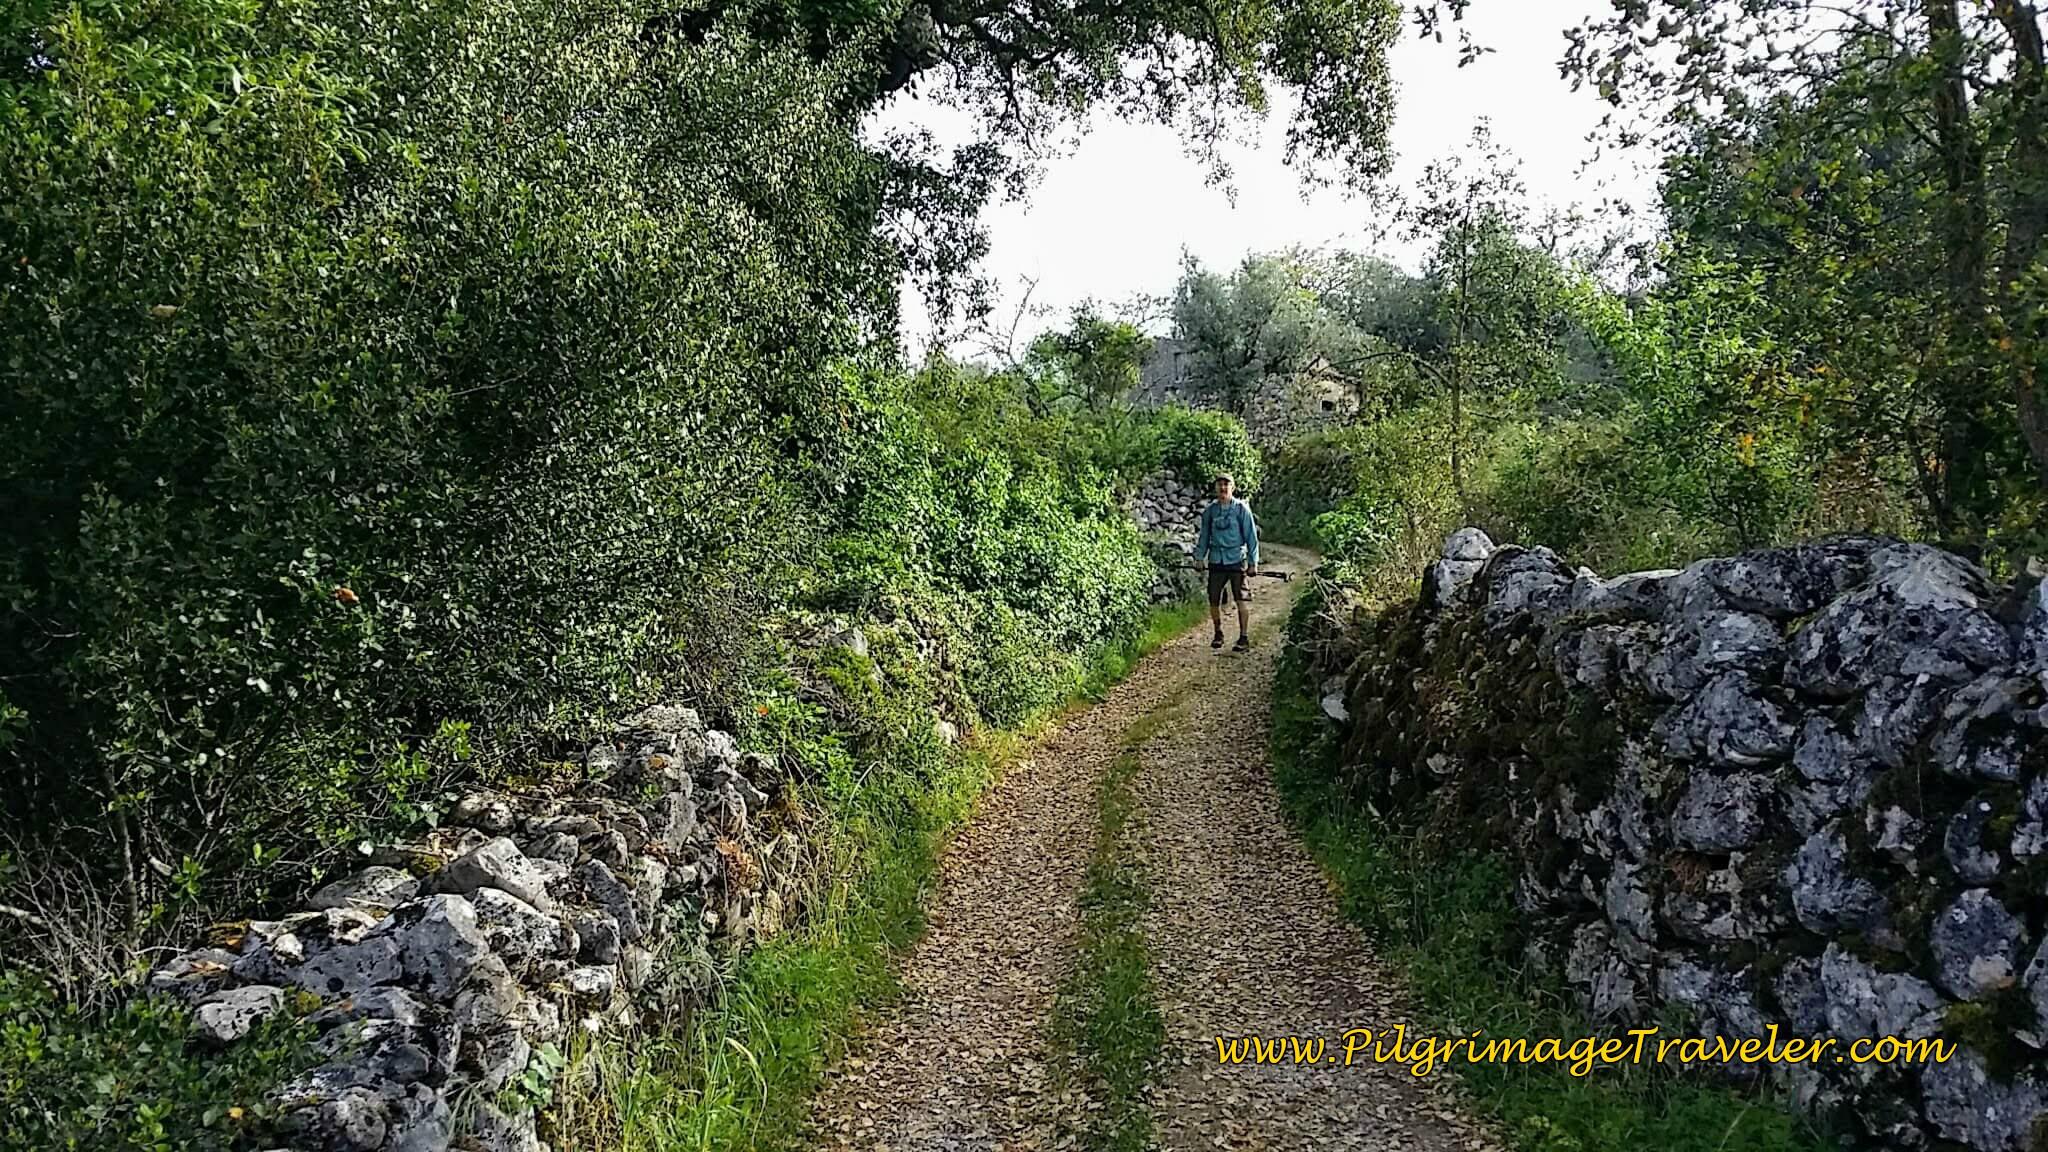 Near Casal Soeiro on the Portuguese Way